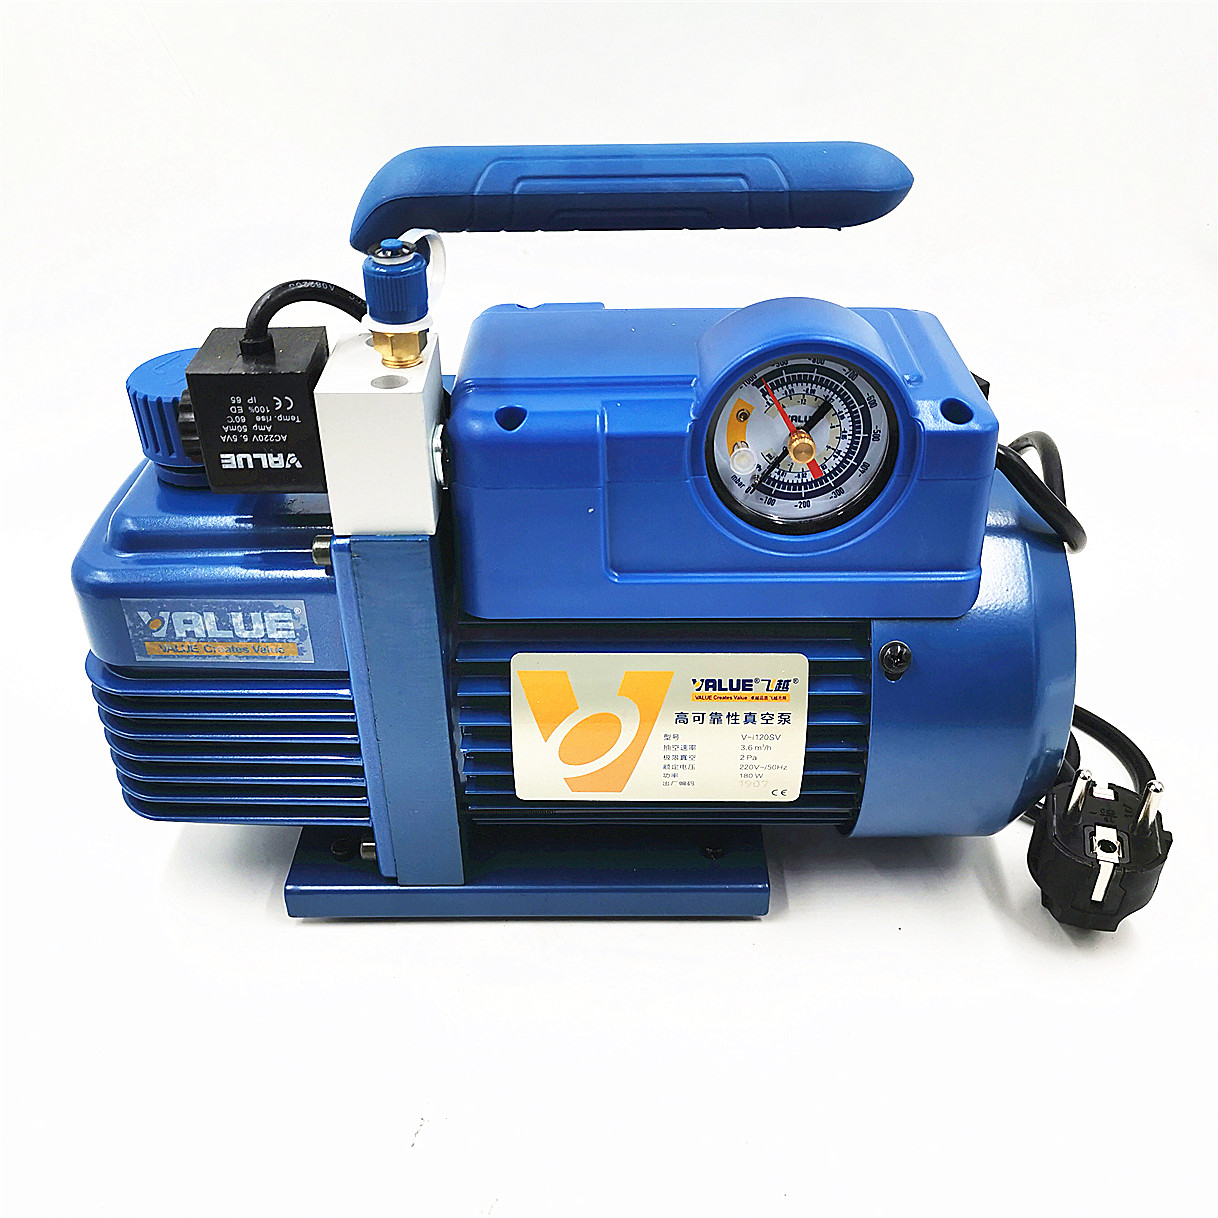 3.6m3/h 220V 180W V-i120SV Air Conditioning Laboratory Air Pump Refrigerate R410 Vacuum Pump 1L R410 R407C, R134a, R12, R22